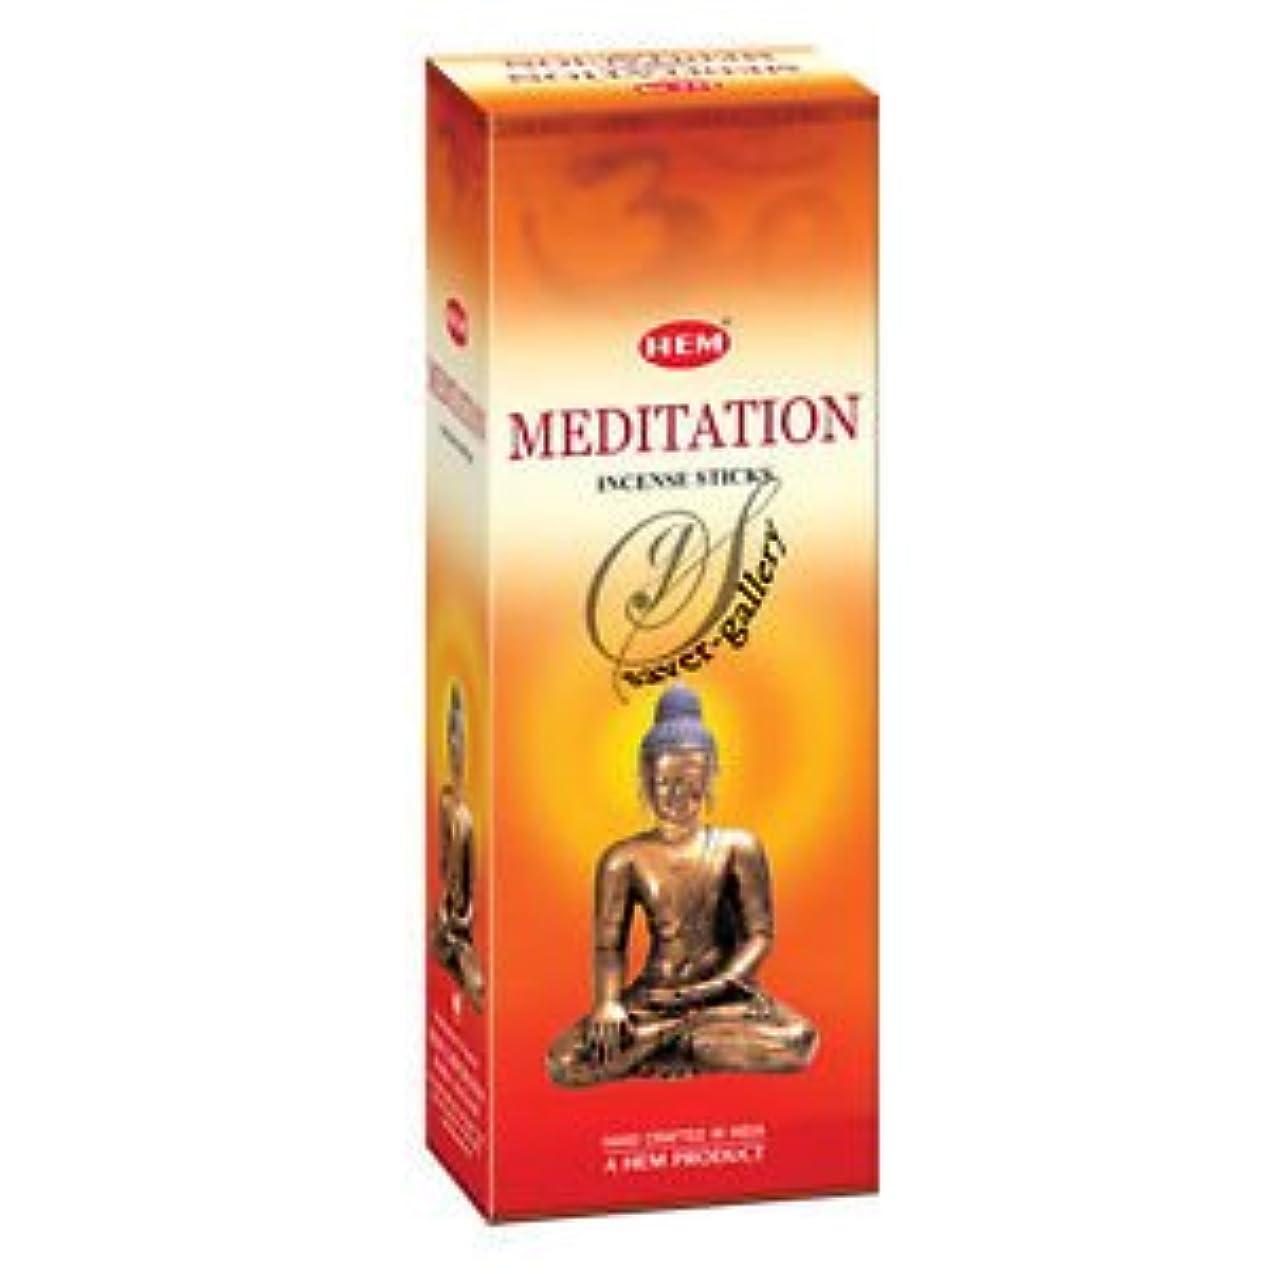 不健康内向き不健康Hem Meditation Incense Sticks (9.3 cm X 6.0 cm X 25.5cm, Black )